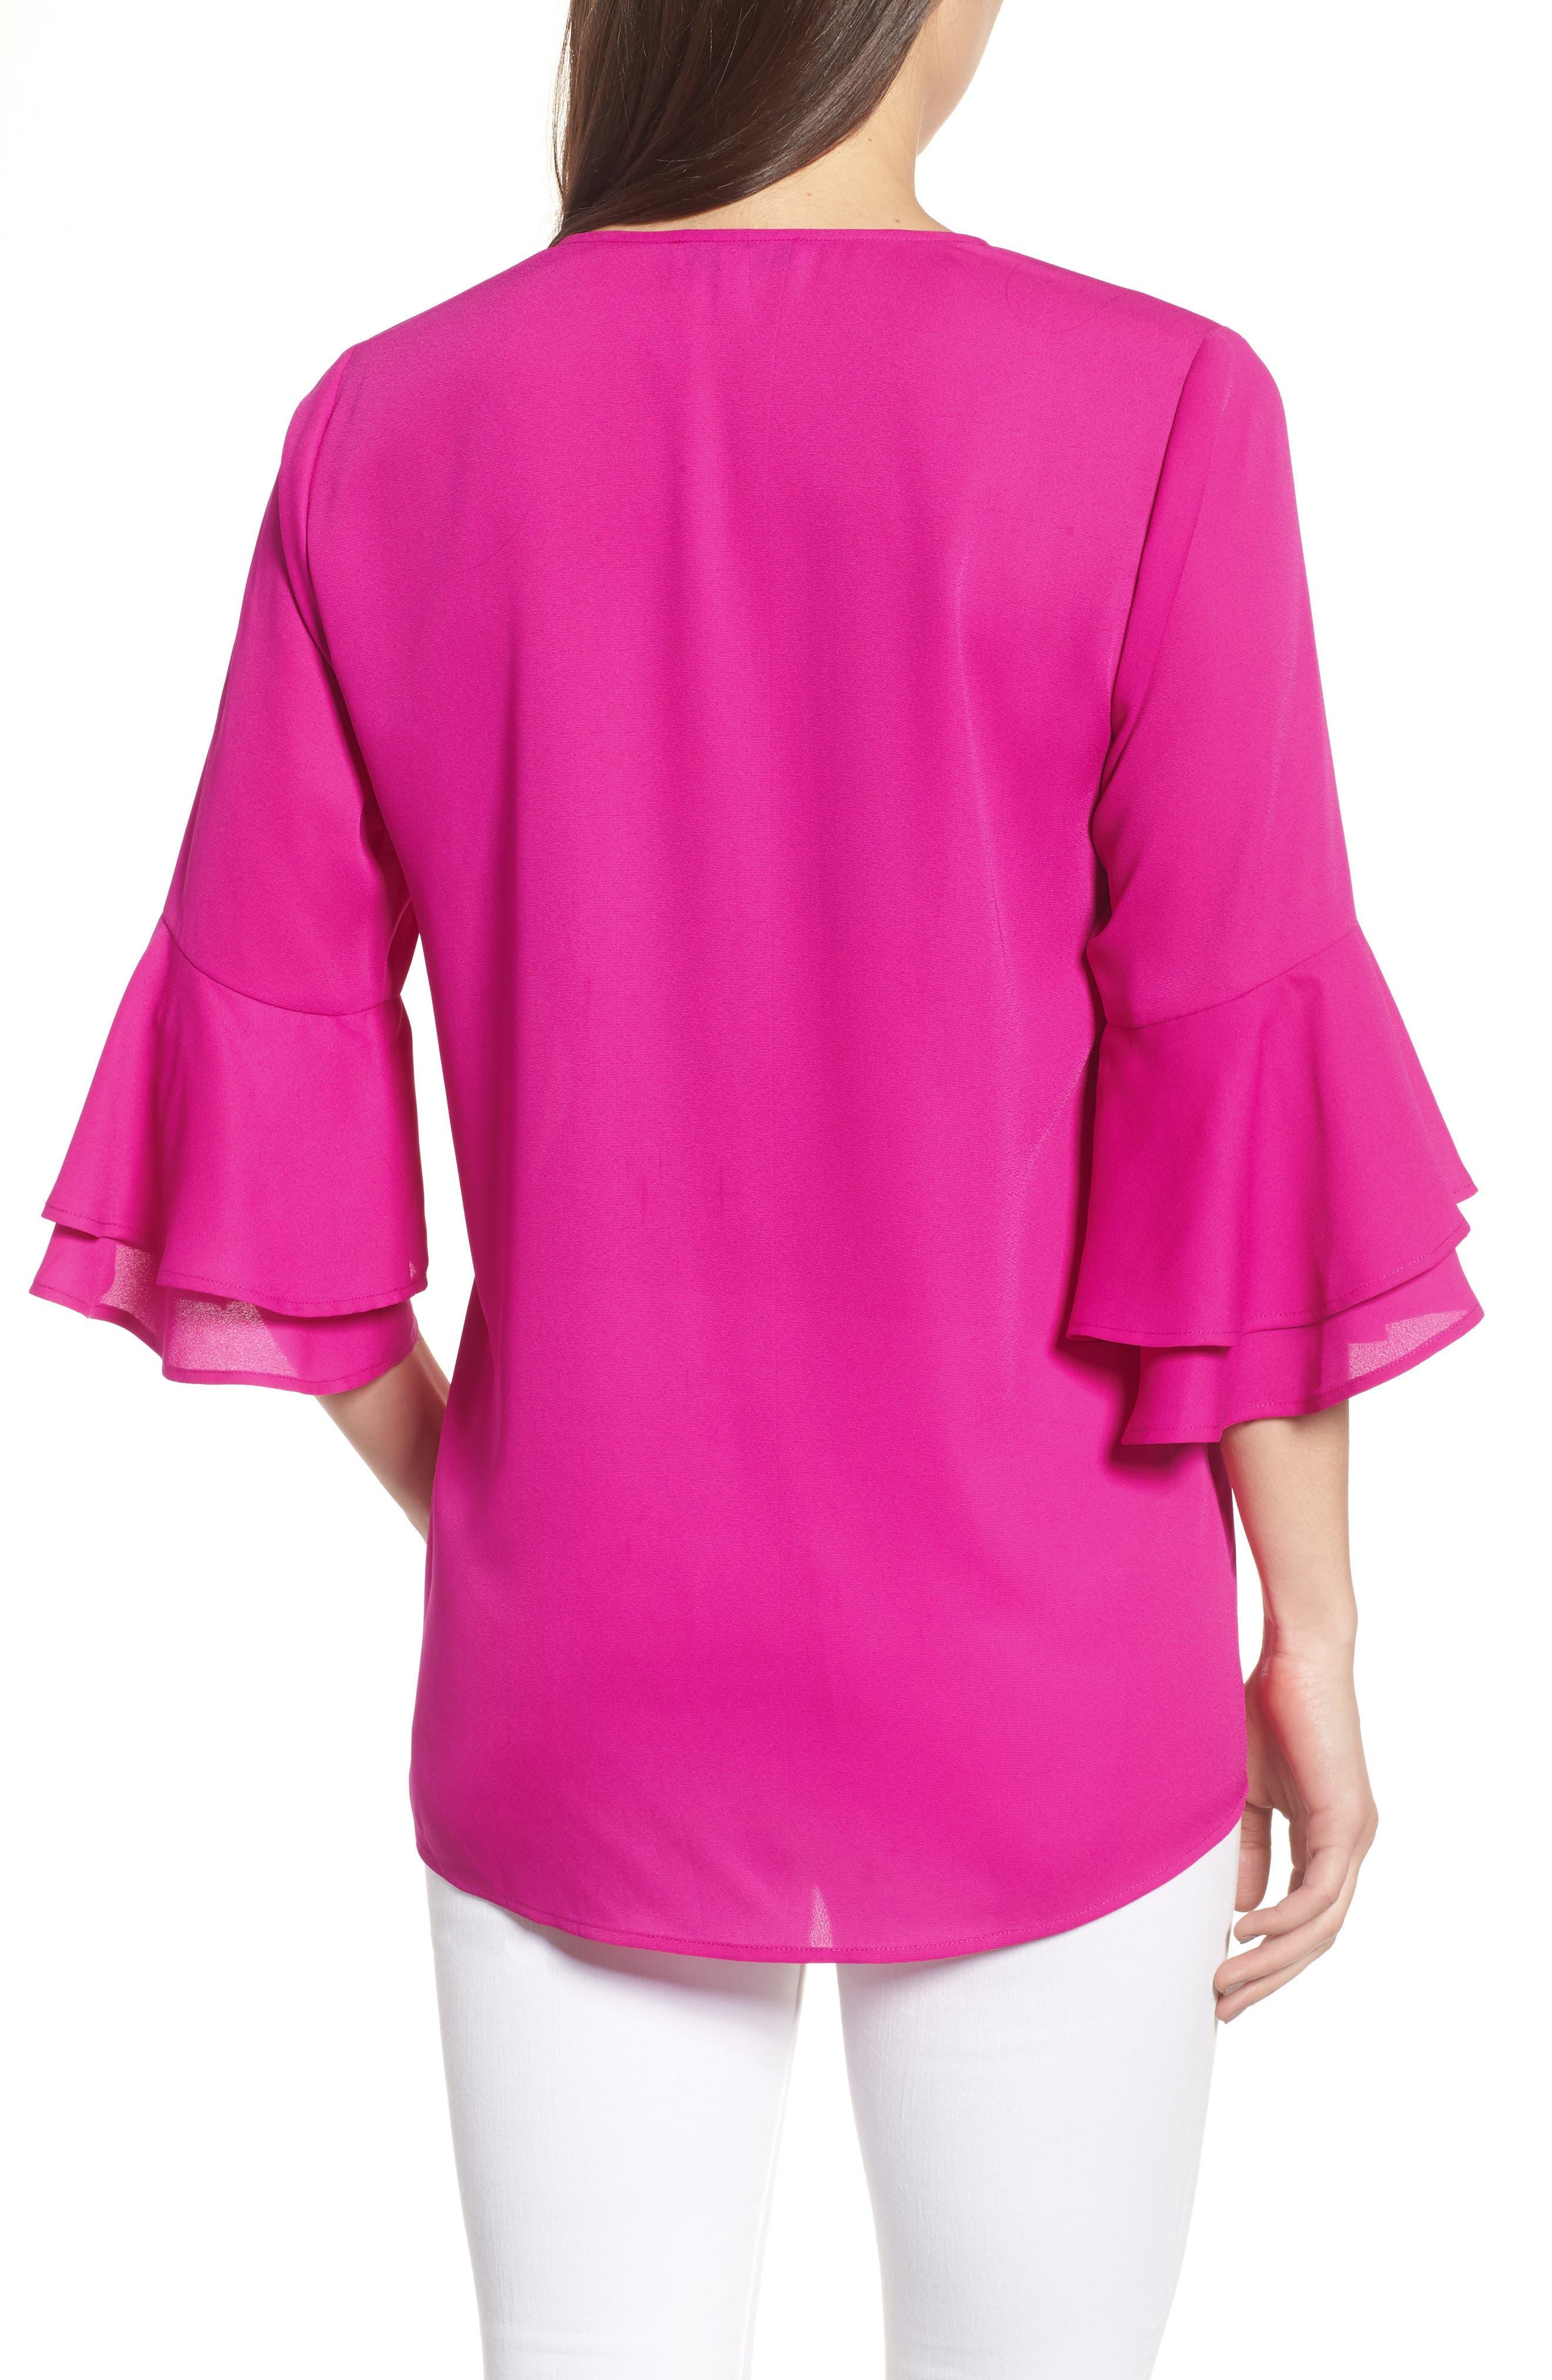 Ruffle Sleeve V-Neck Blouse,                             Alternate thumbnail 2, color,                             686-Pink Nouveau